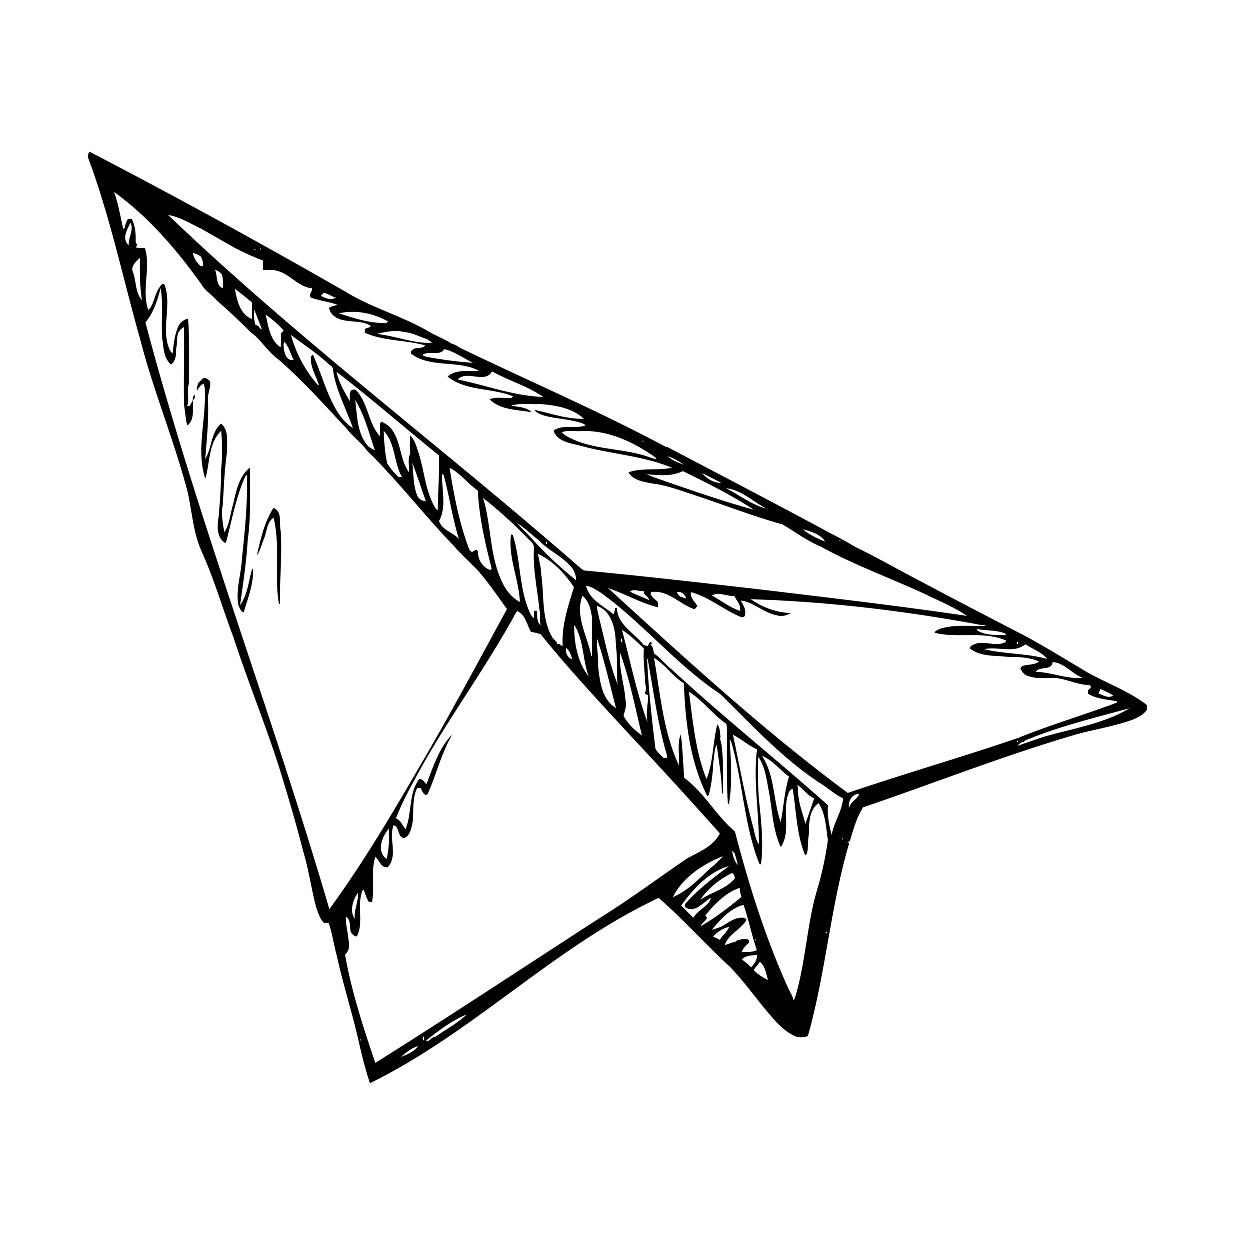 1235x1235 Paper Airplane Drawing Printable Image Illustration Sketch